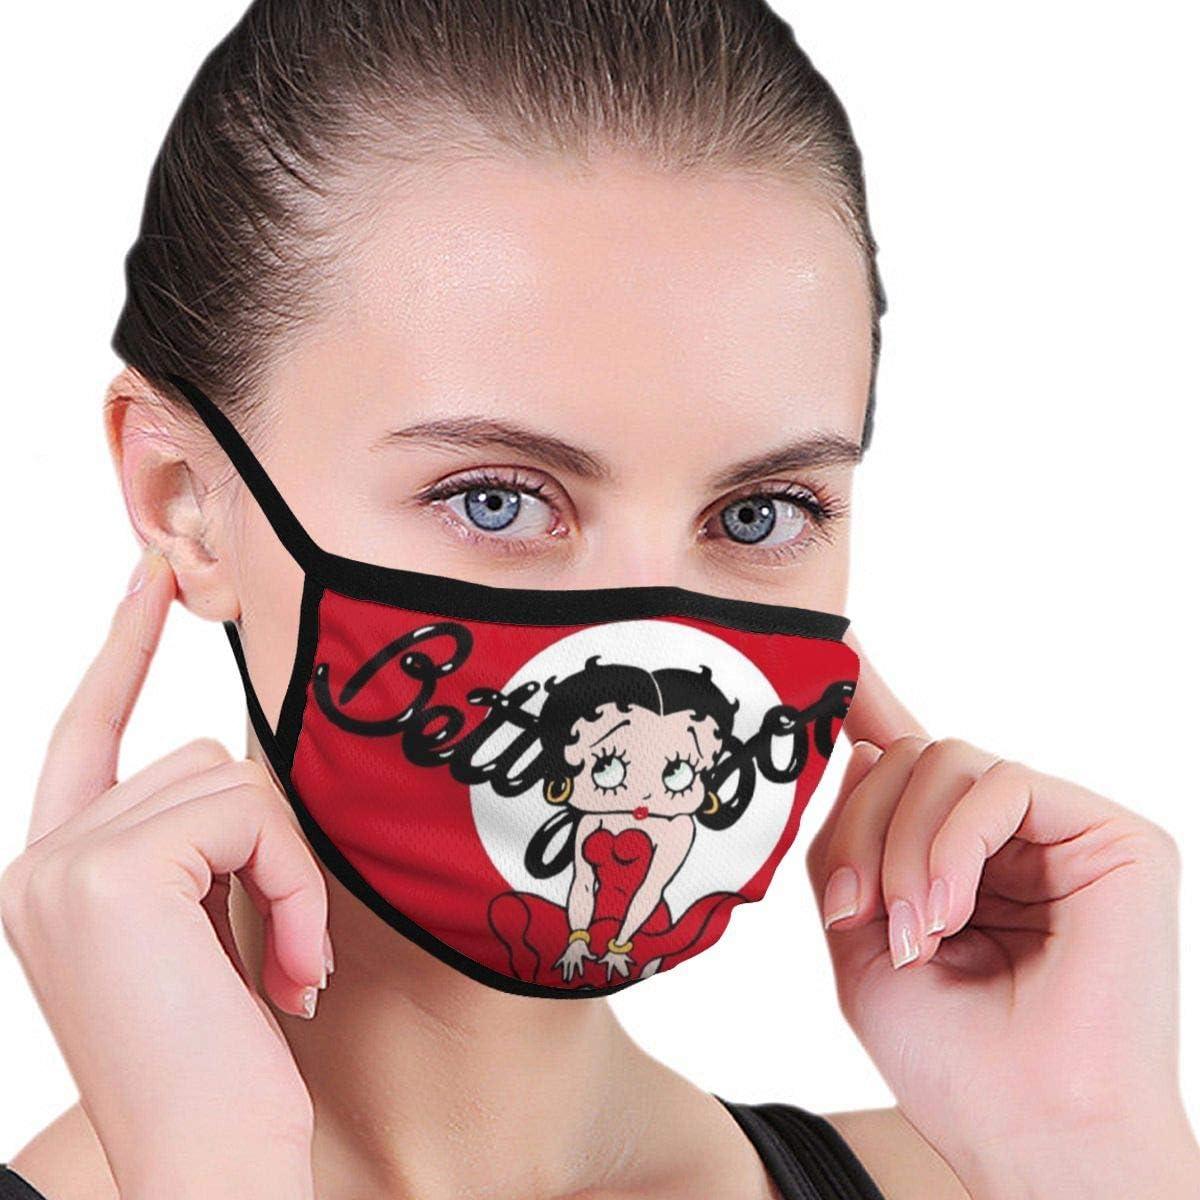 Bandana Bon Jovi Balaclava-Multifunctional Unisex Outdoor Scarf Neck Warmer Turban Balaclava Headdress Face Balaclavas Bandanas For Women//Men Black